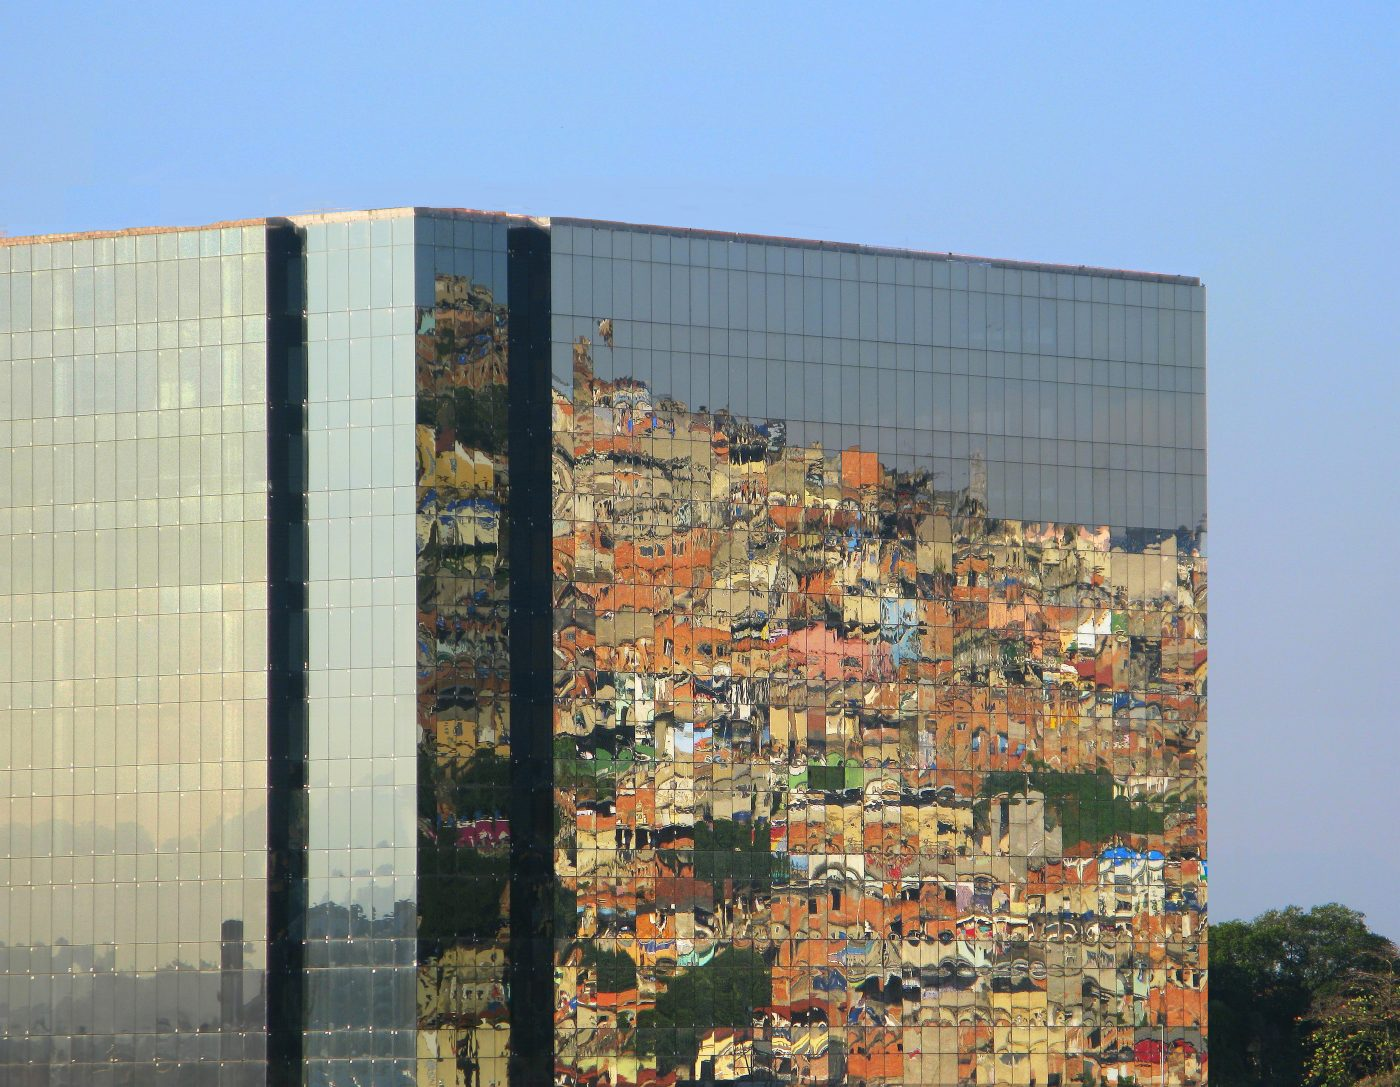 Tale of Two Cities-Rio de Janeiro